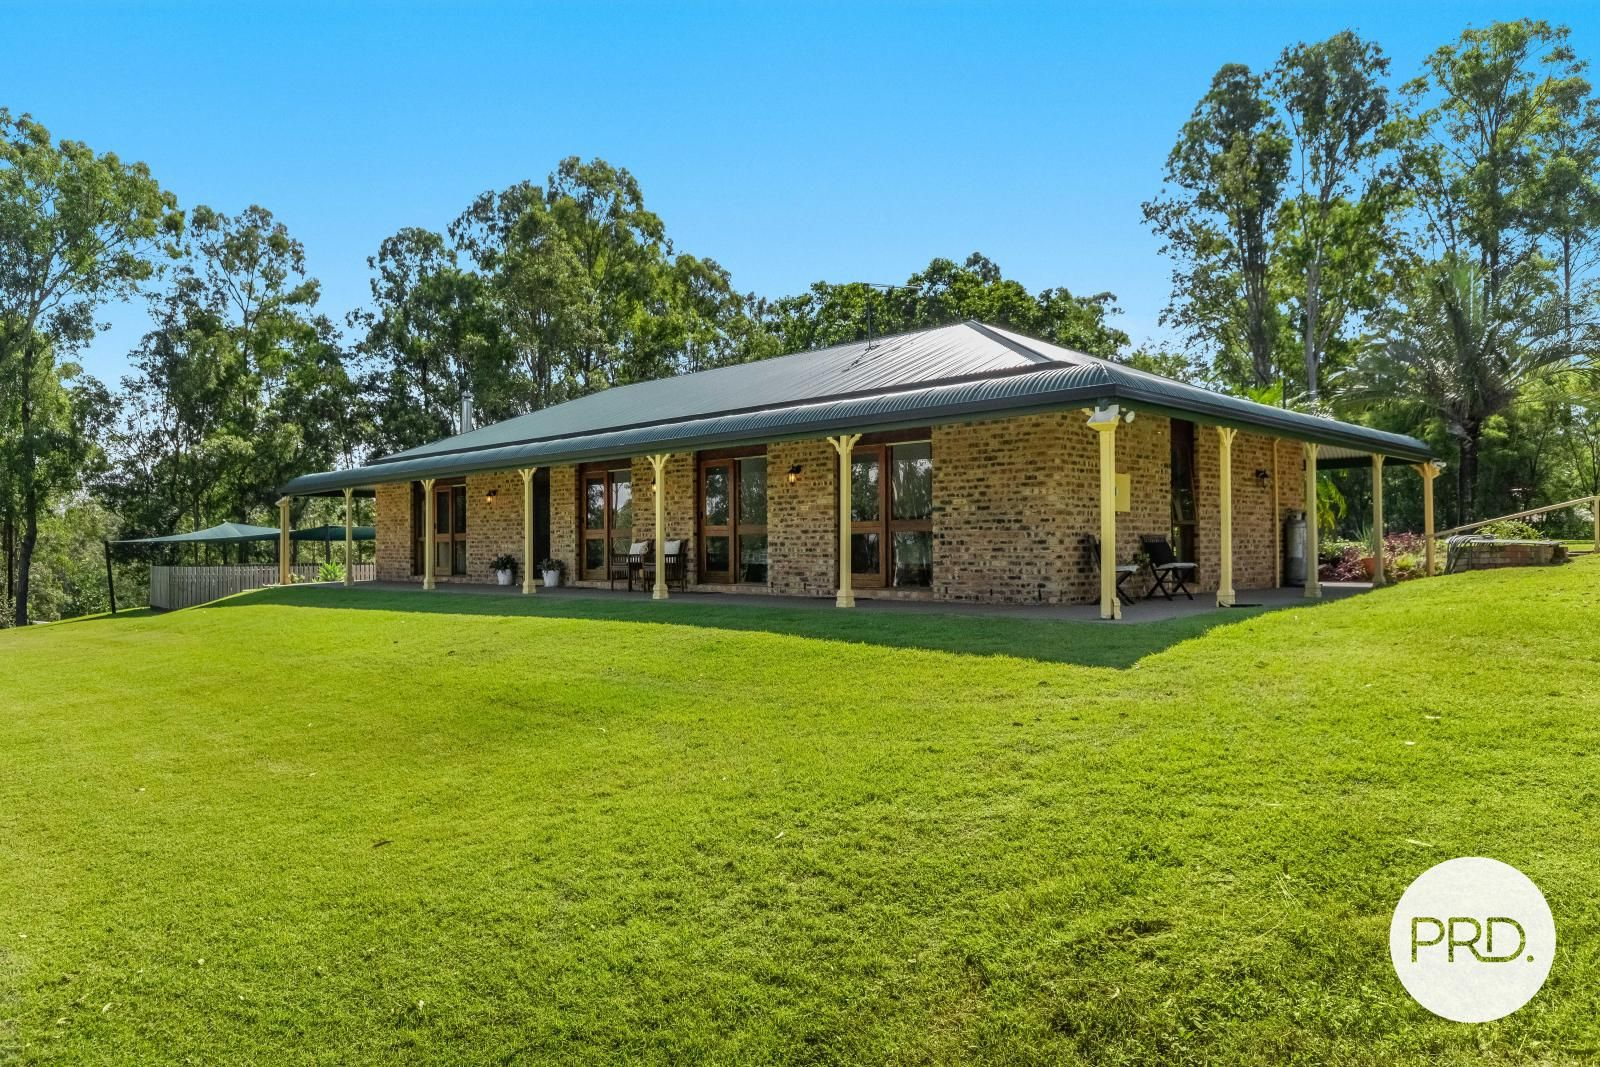 50 Brahman Way, North Casino NSW 2470, Image 0